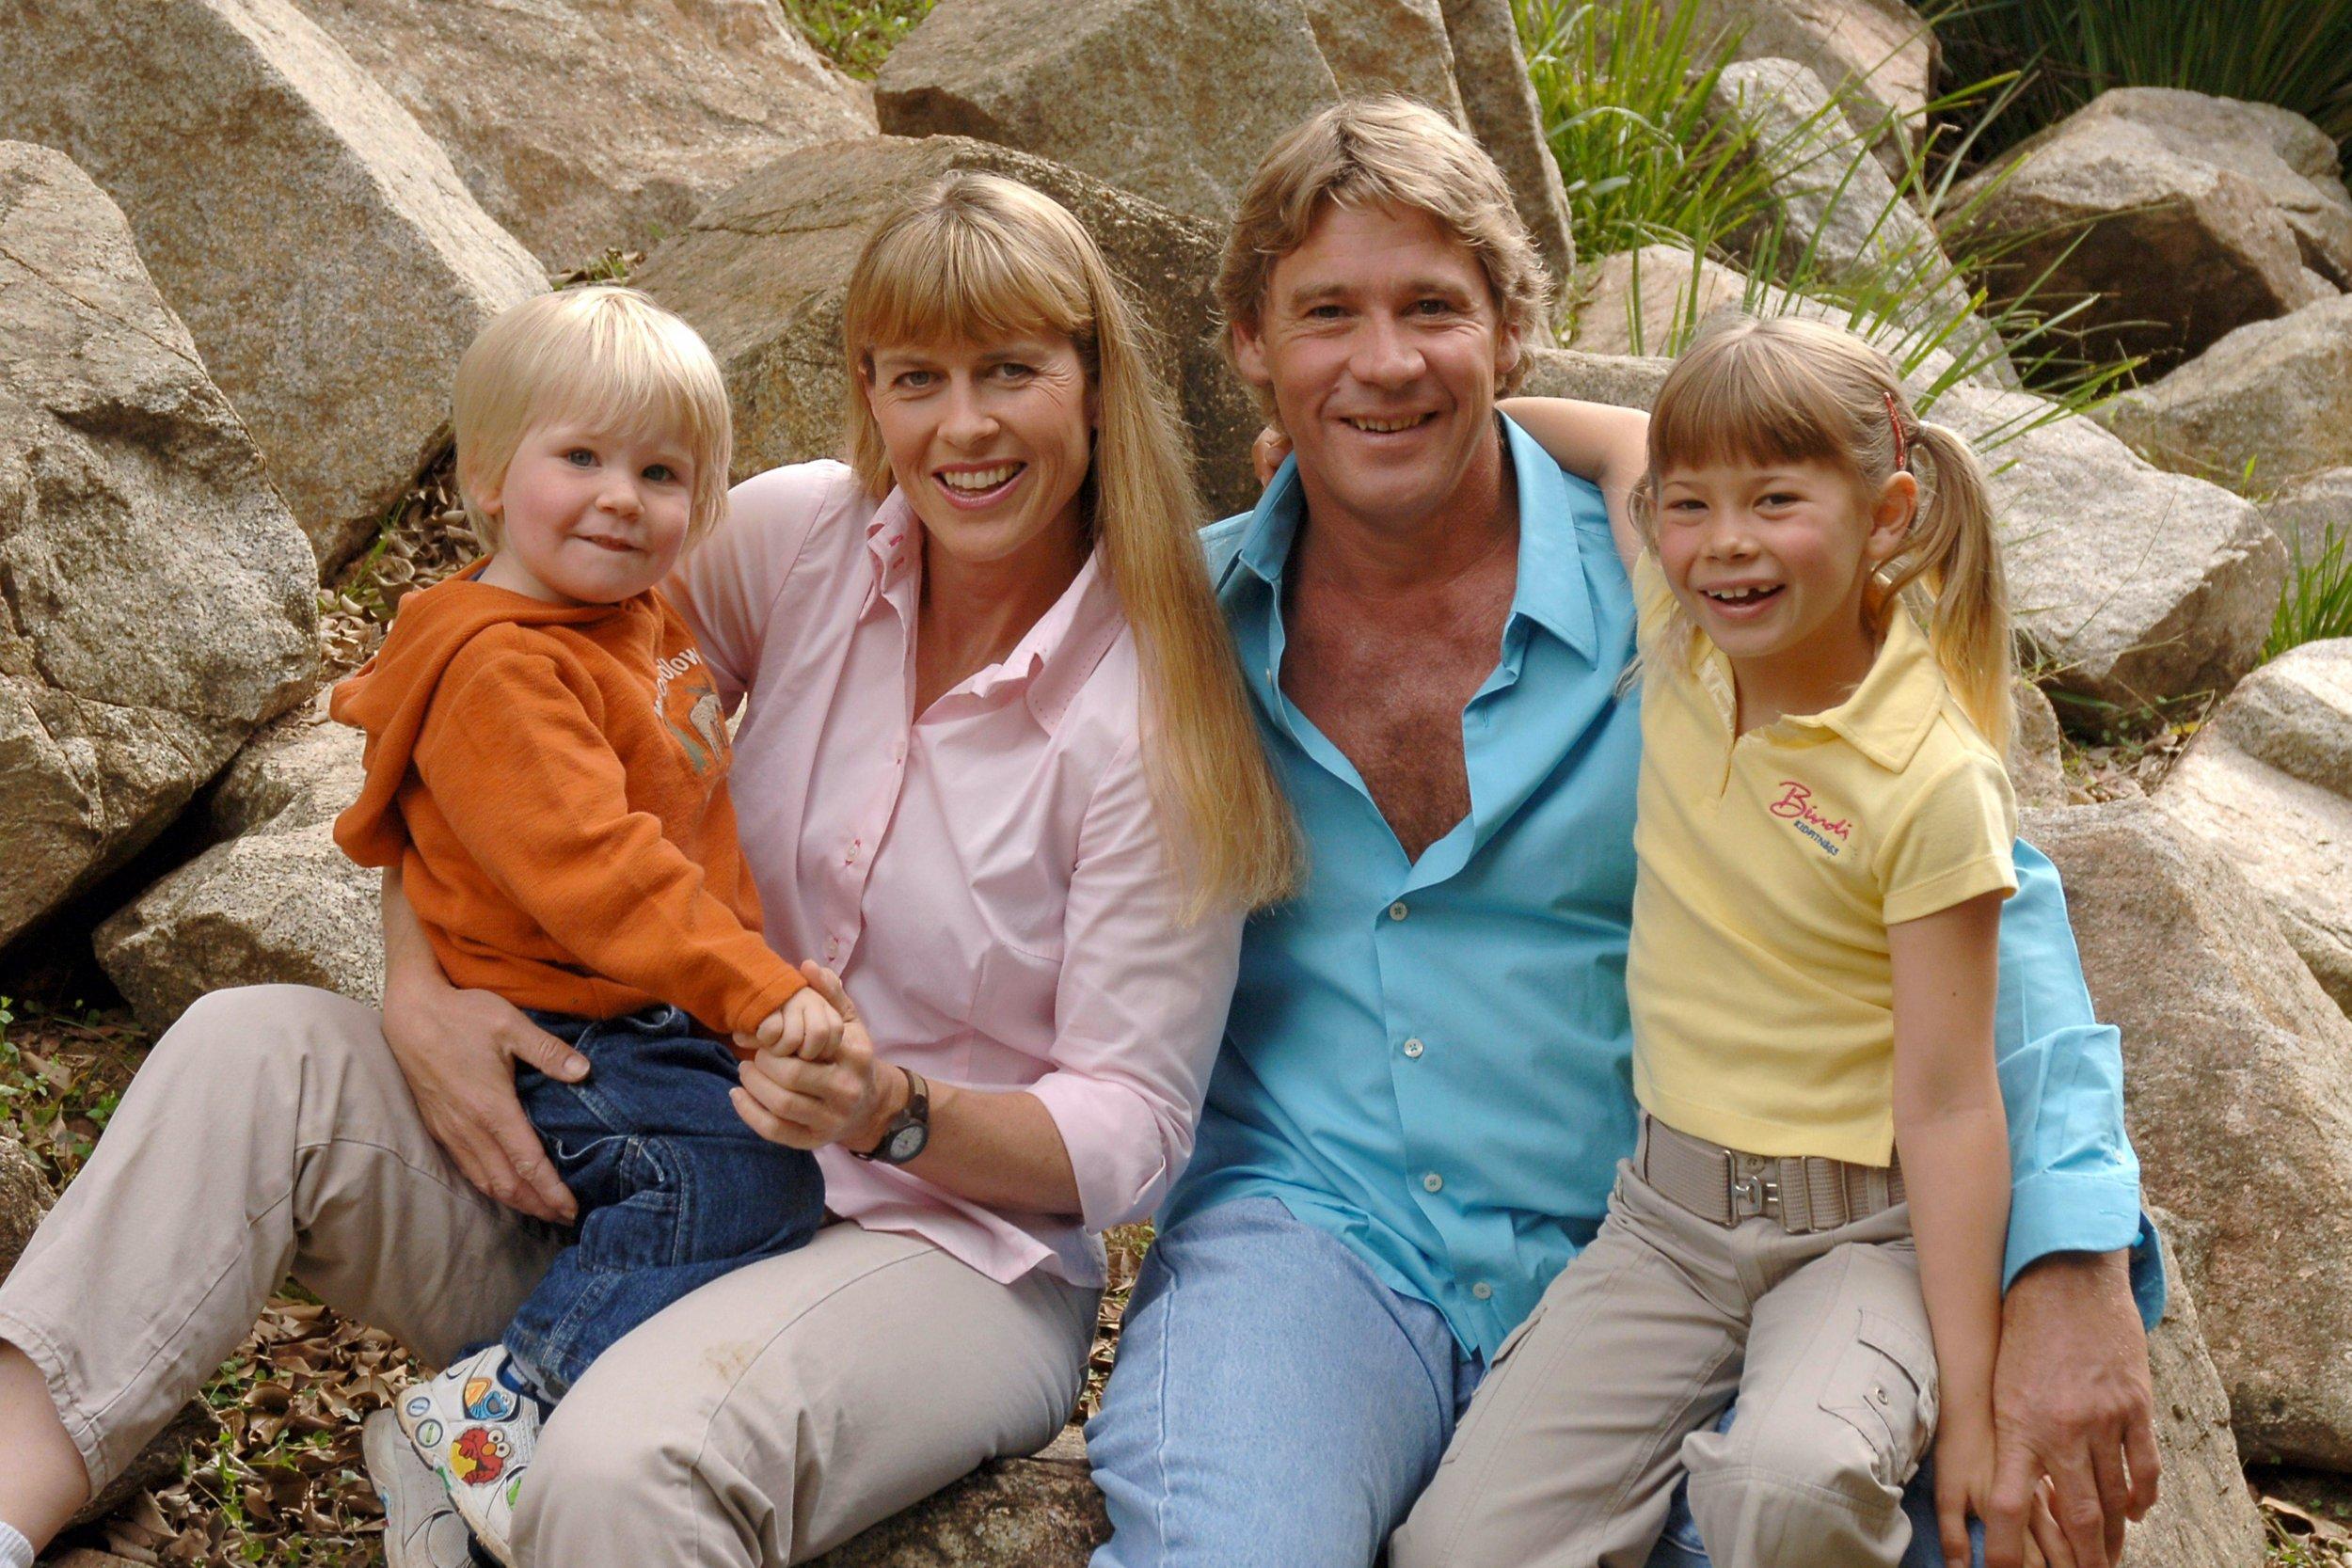 crocodile hunter with his family